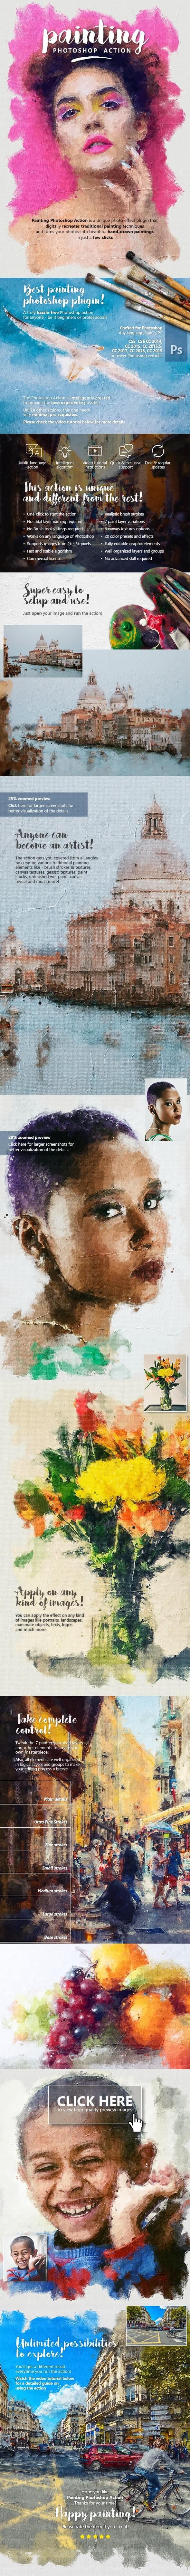 اکشن فتوشاپ تبدیل عکس به نقاشی رنگ روغن